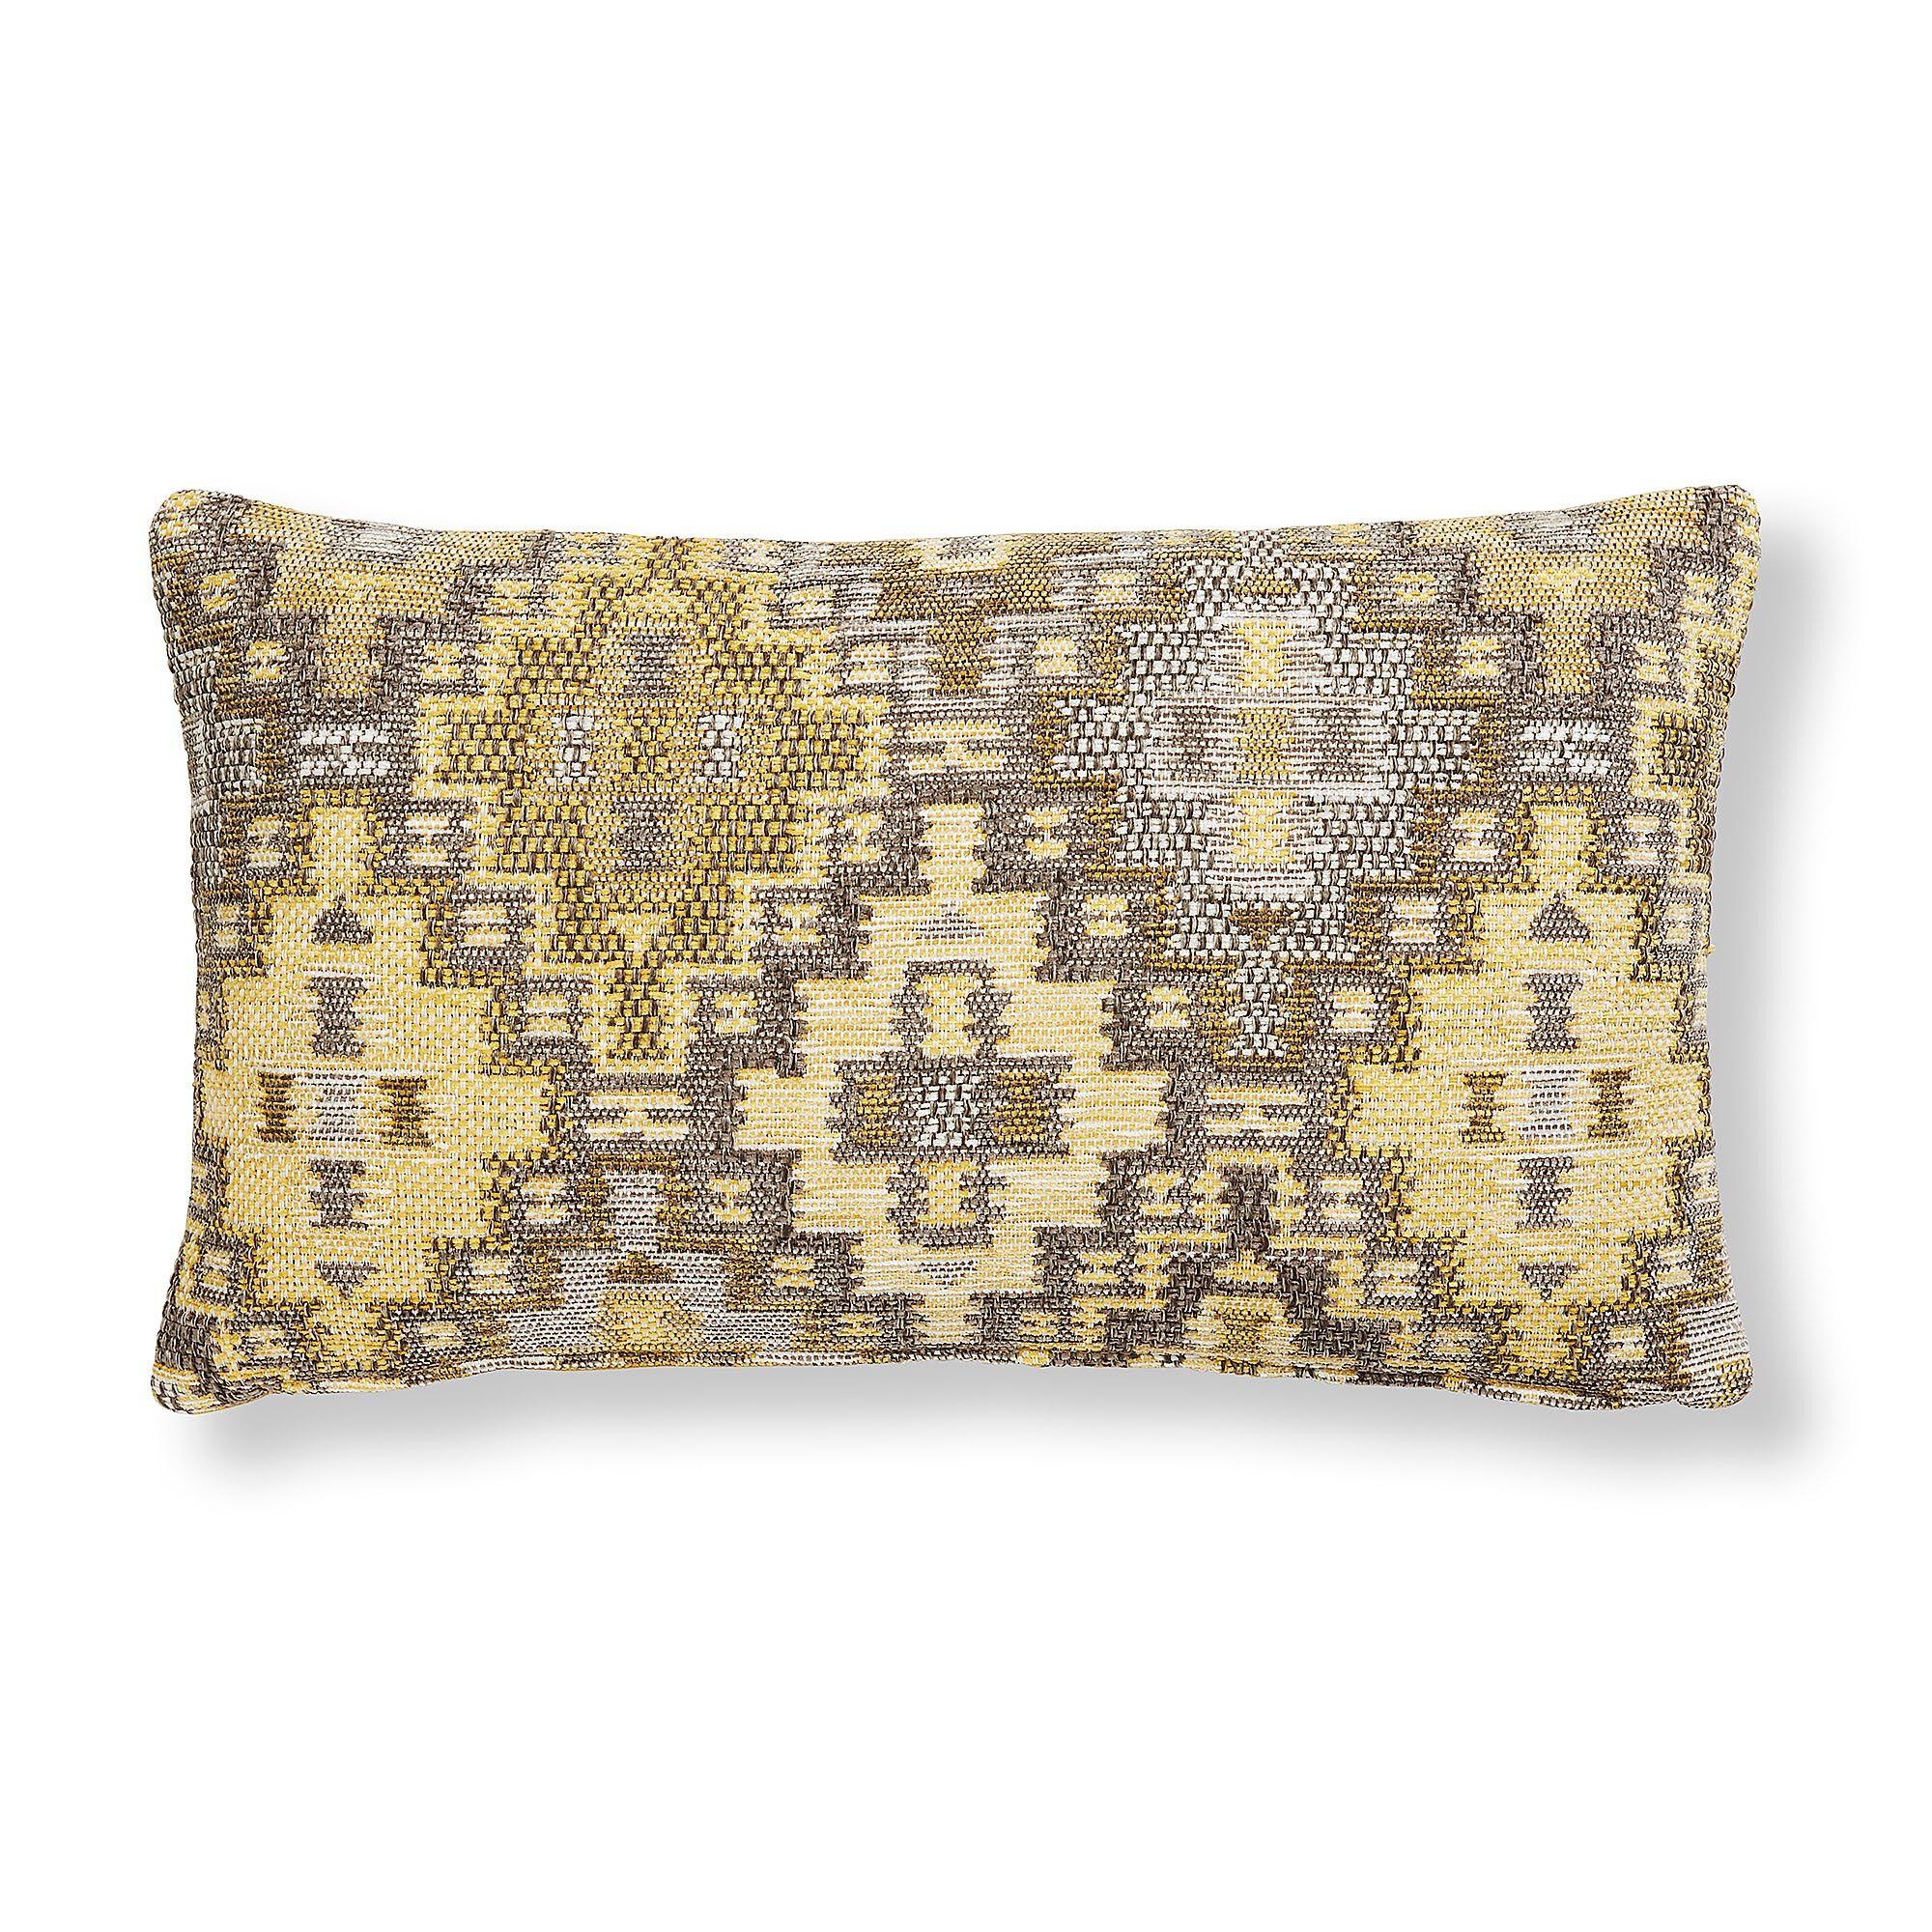 Kave Home Fodera cuscino Nazca 30 x 50 cm senape